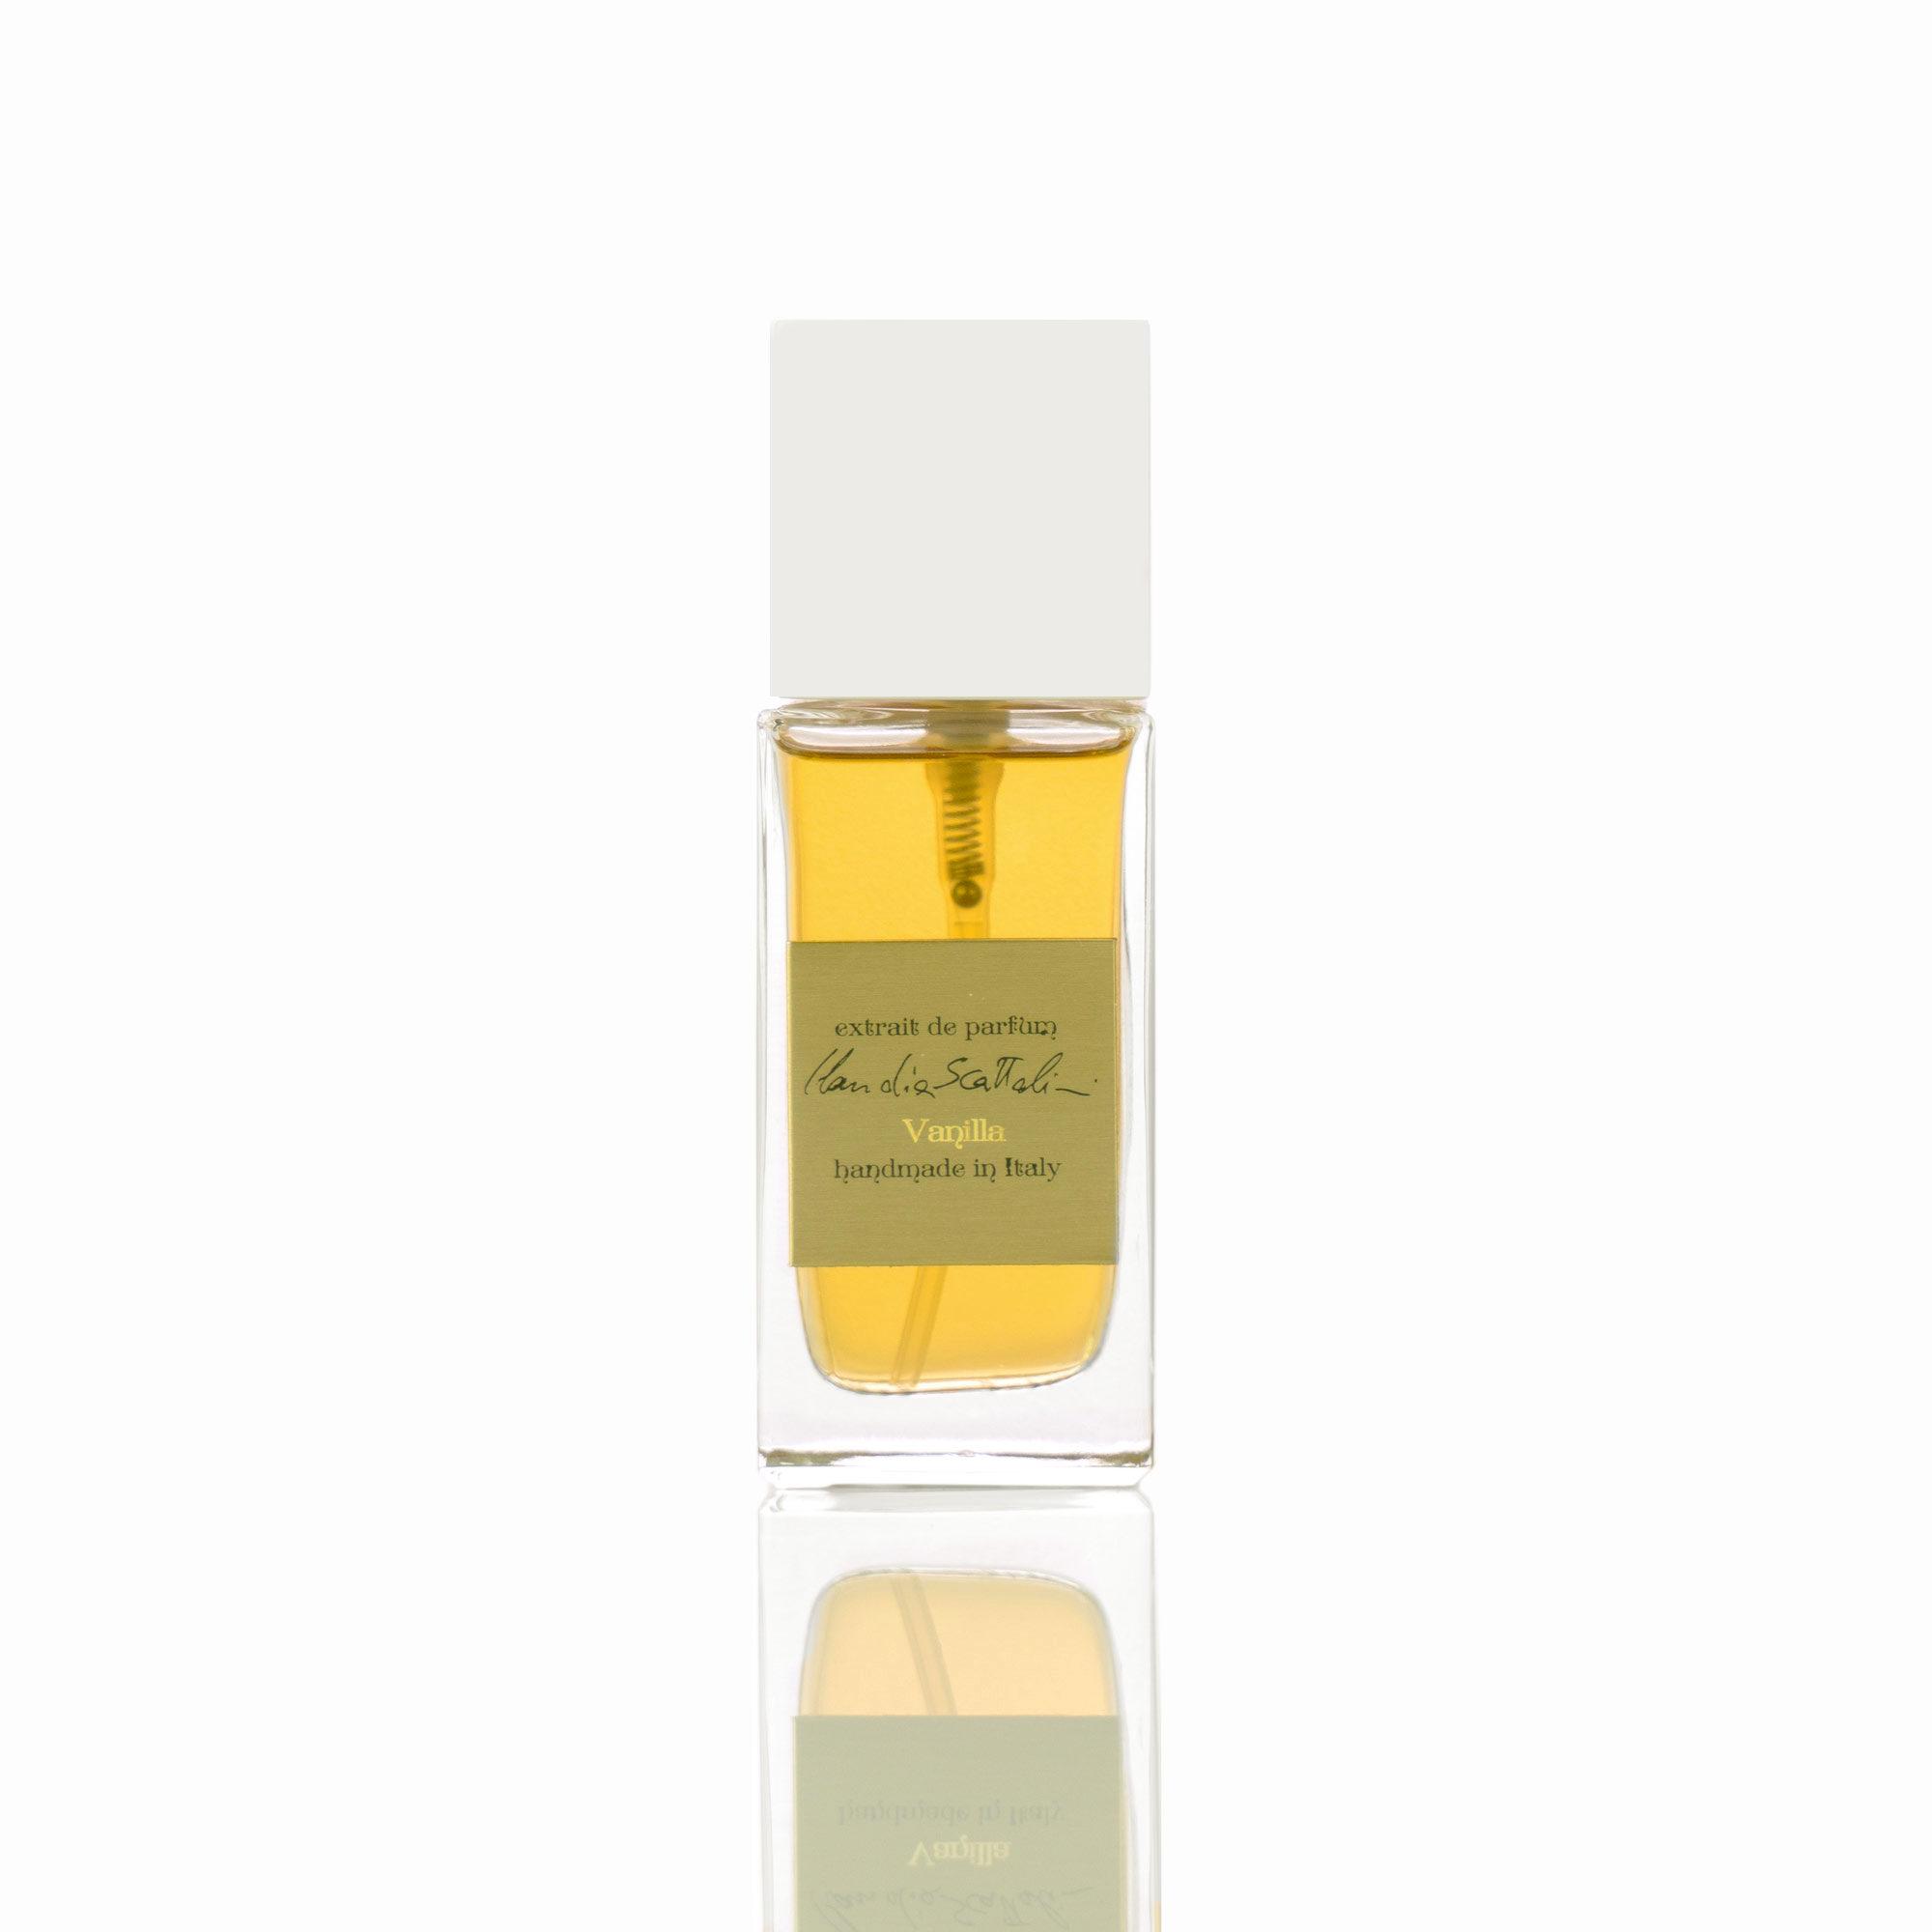 Vanilla - Extrait de parfum